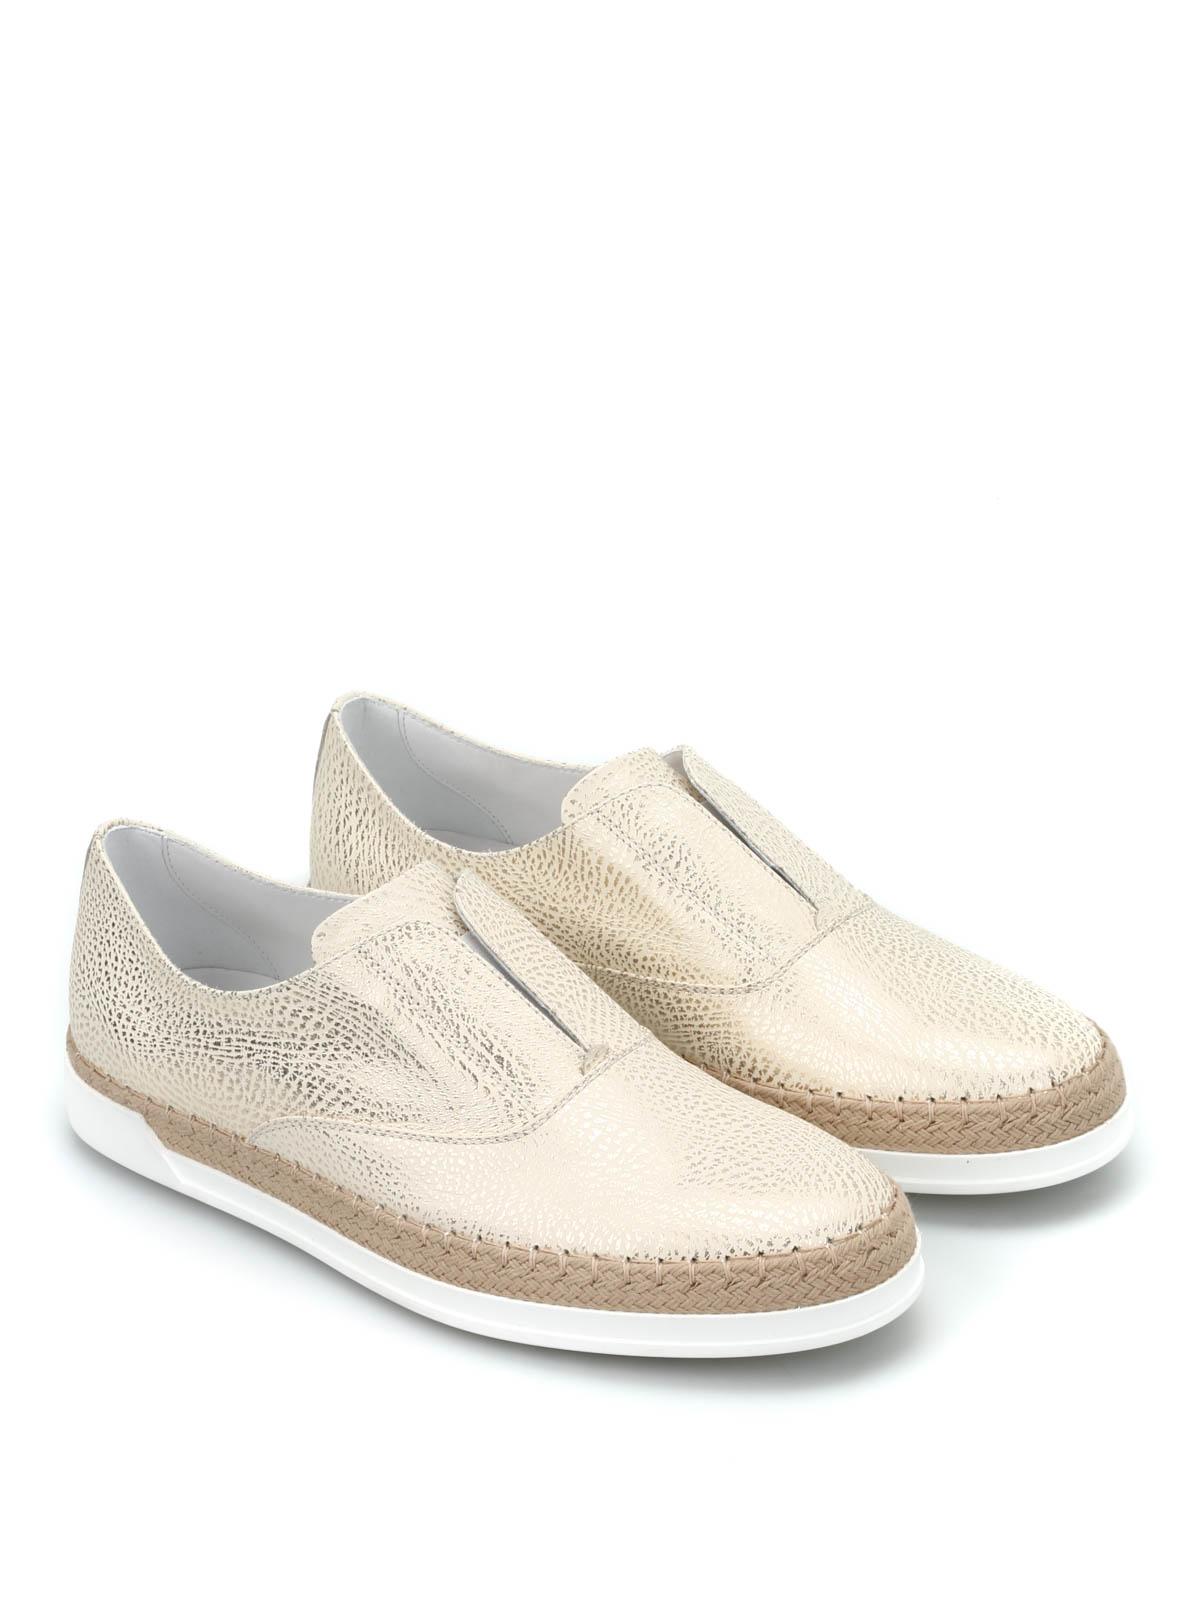 mokassins slippers fur damen gold von tod 39 s mokassins und slippers ikrix. Black Bedroom Furniture Sets. Home Design Ideas